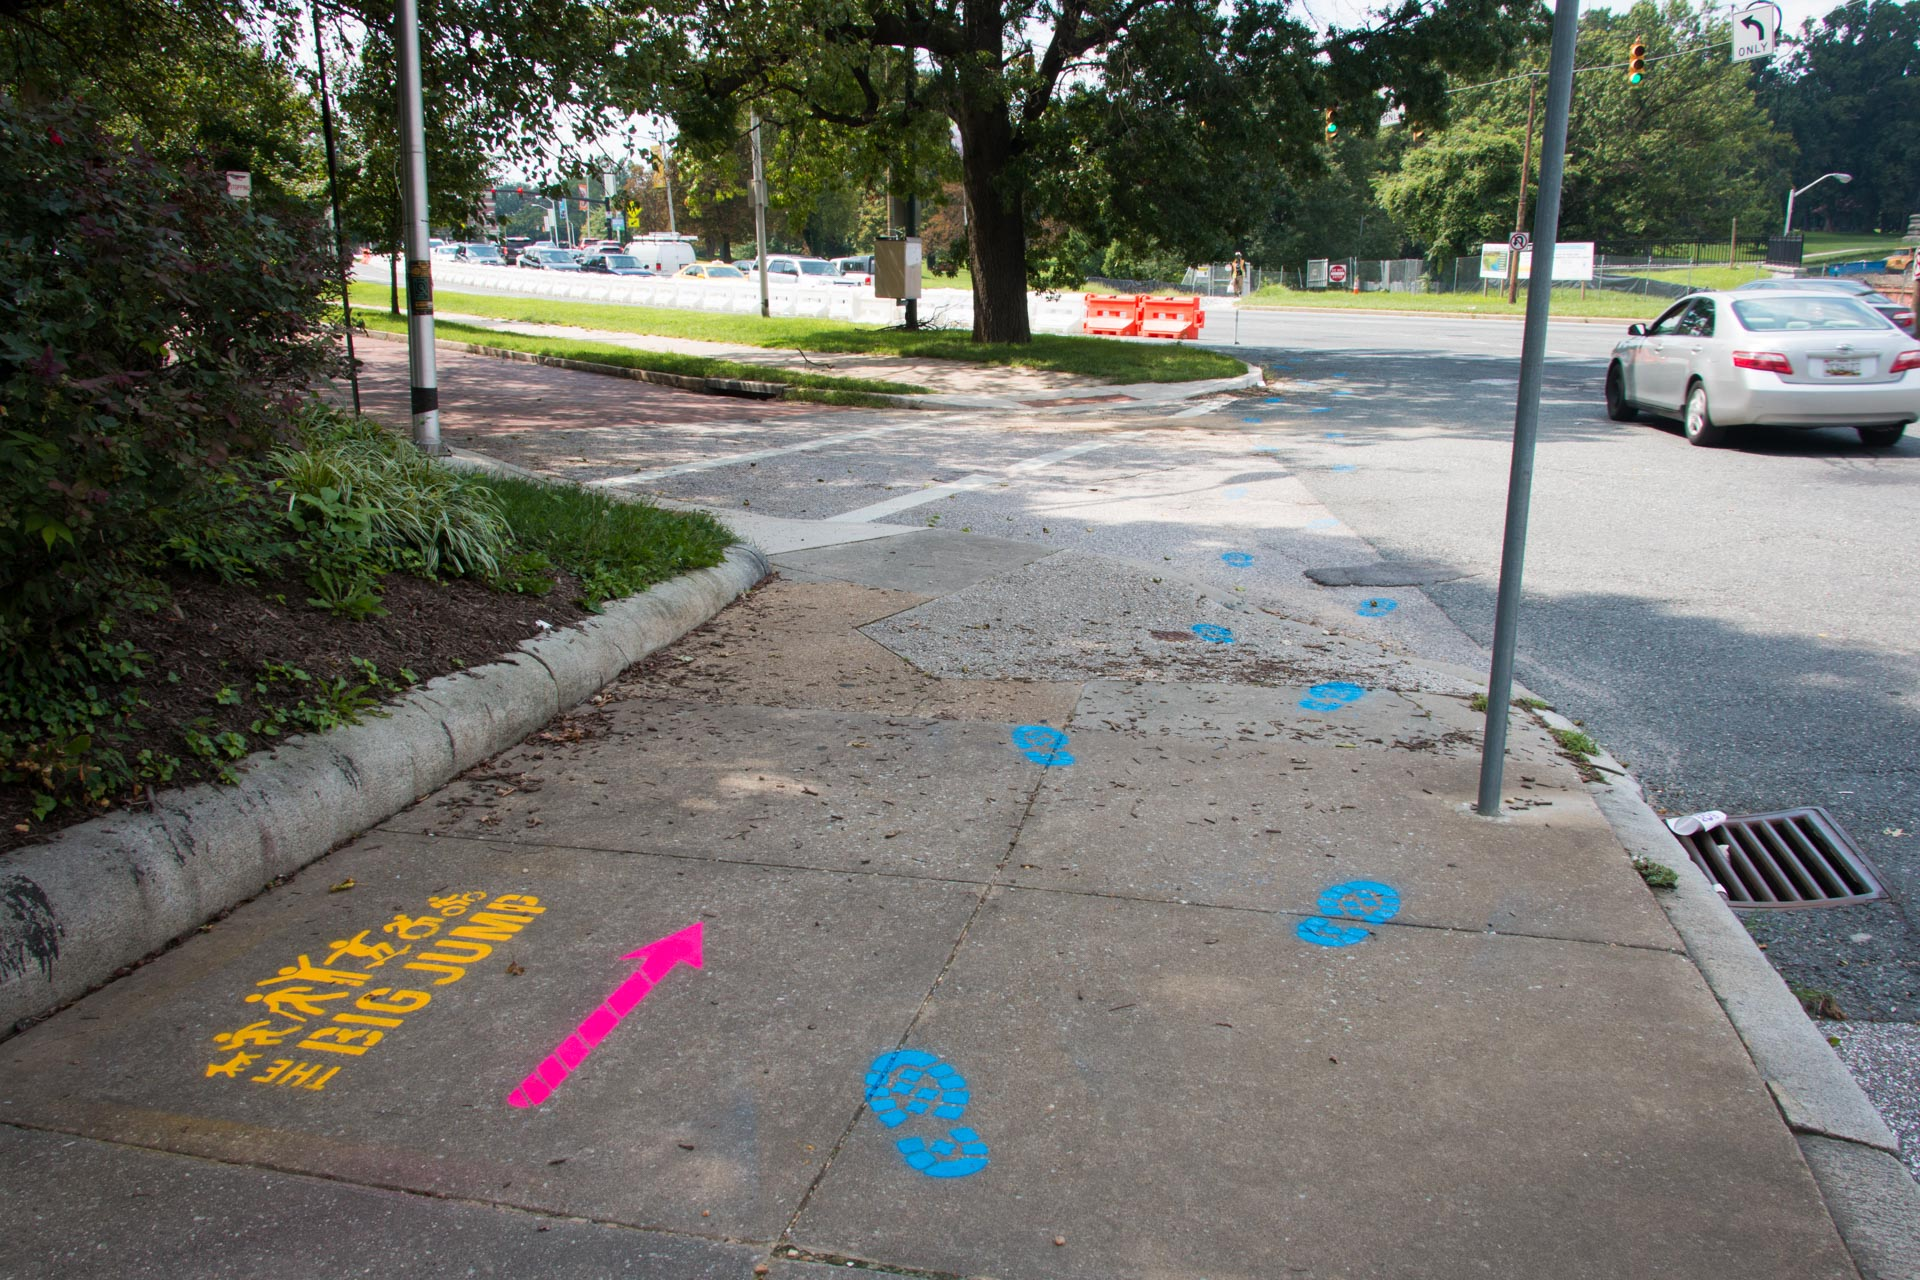 180816 Big Jump side street stencil wayfinding Eutaw Pl